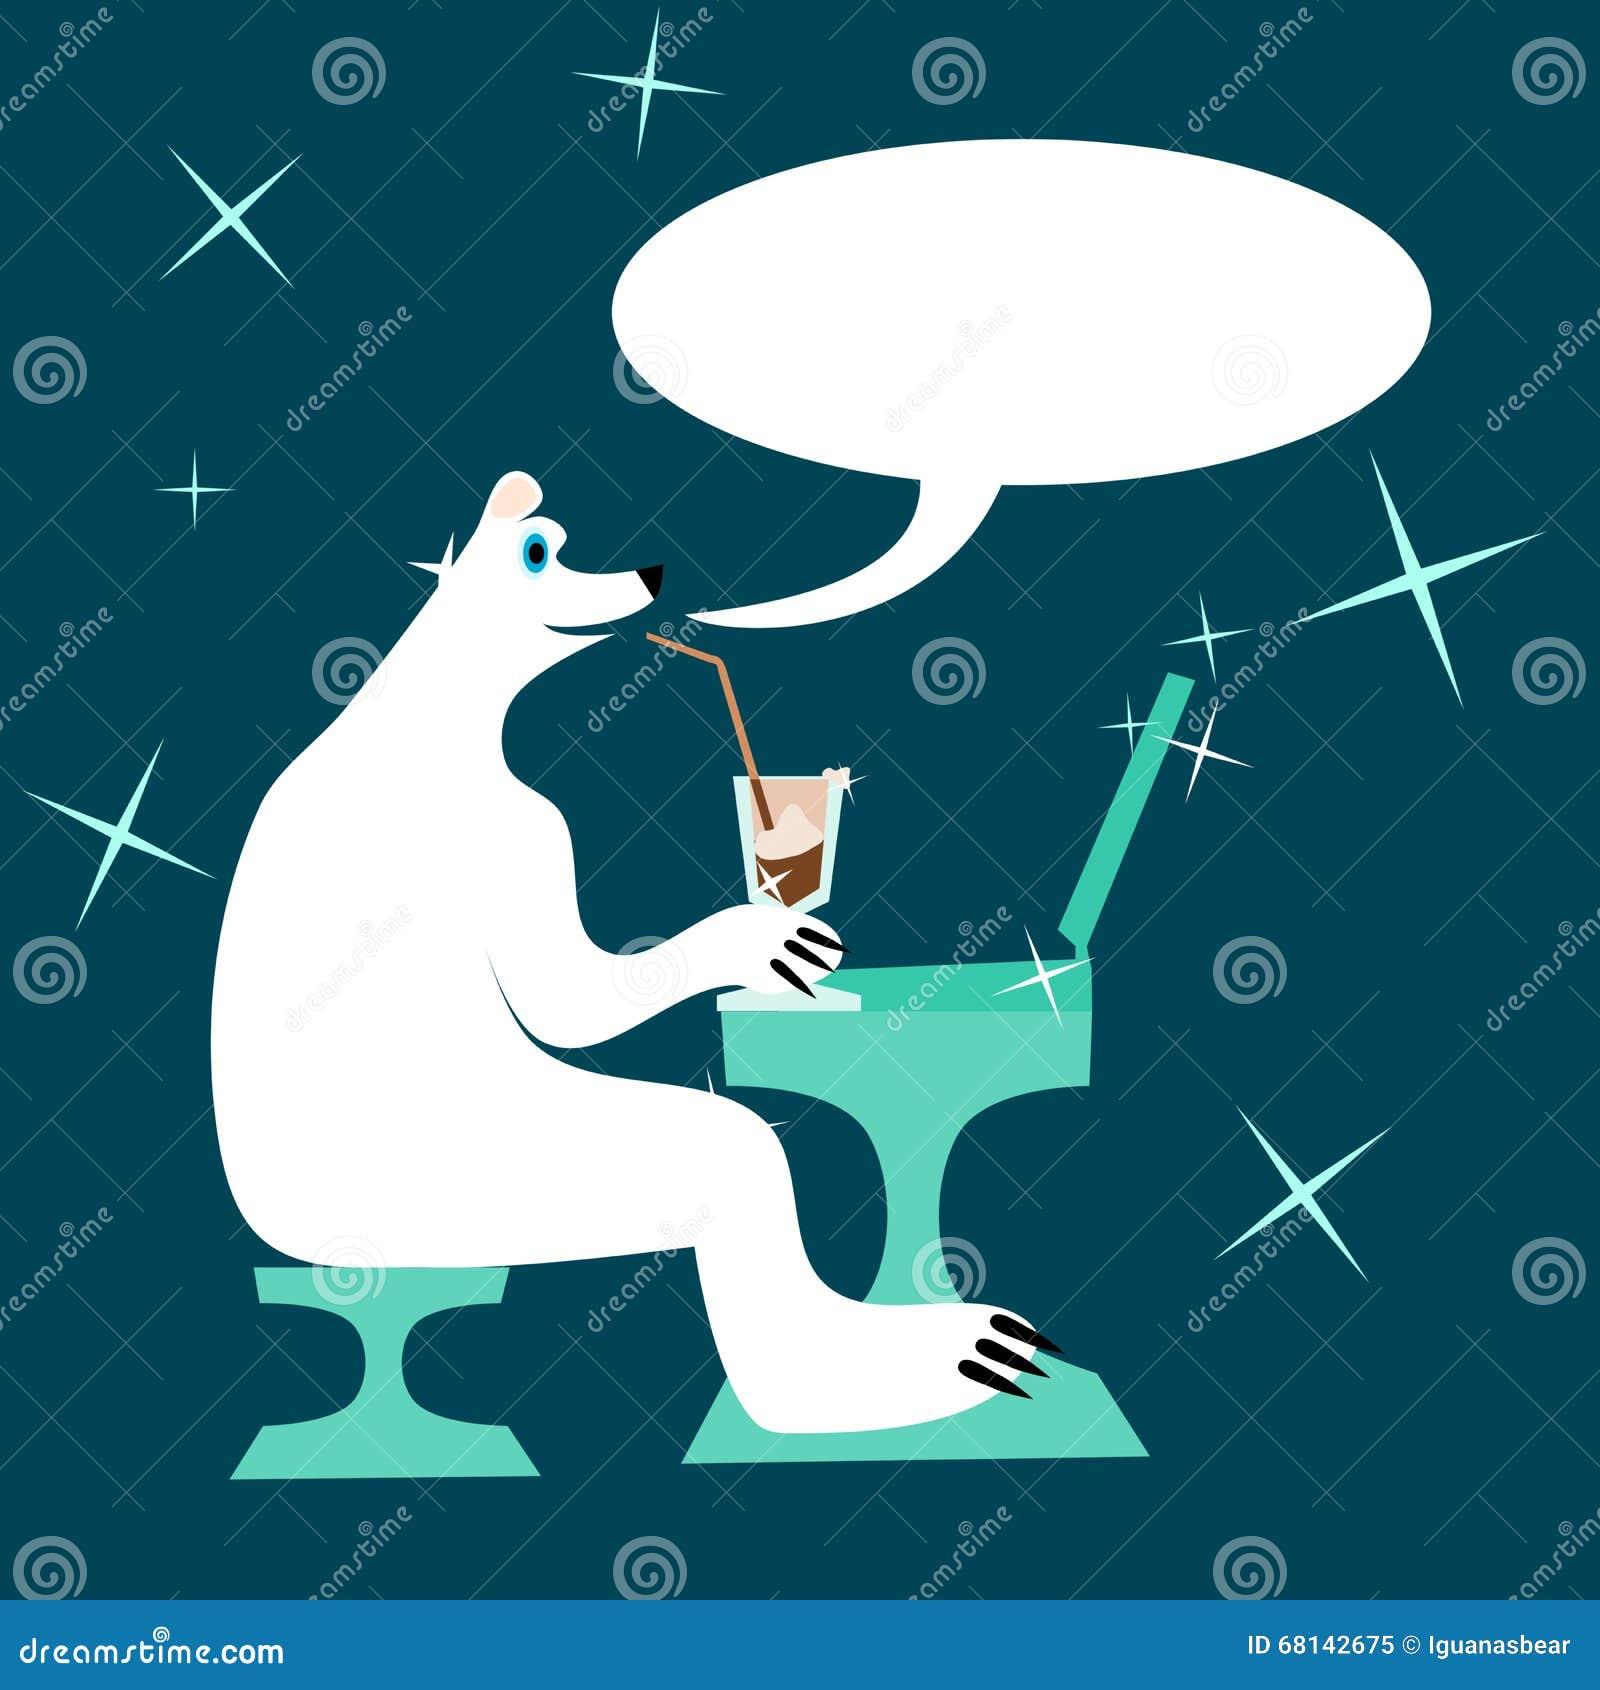 Cartoon Polar Bear Drinking Iced Coffee And Writing To